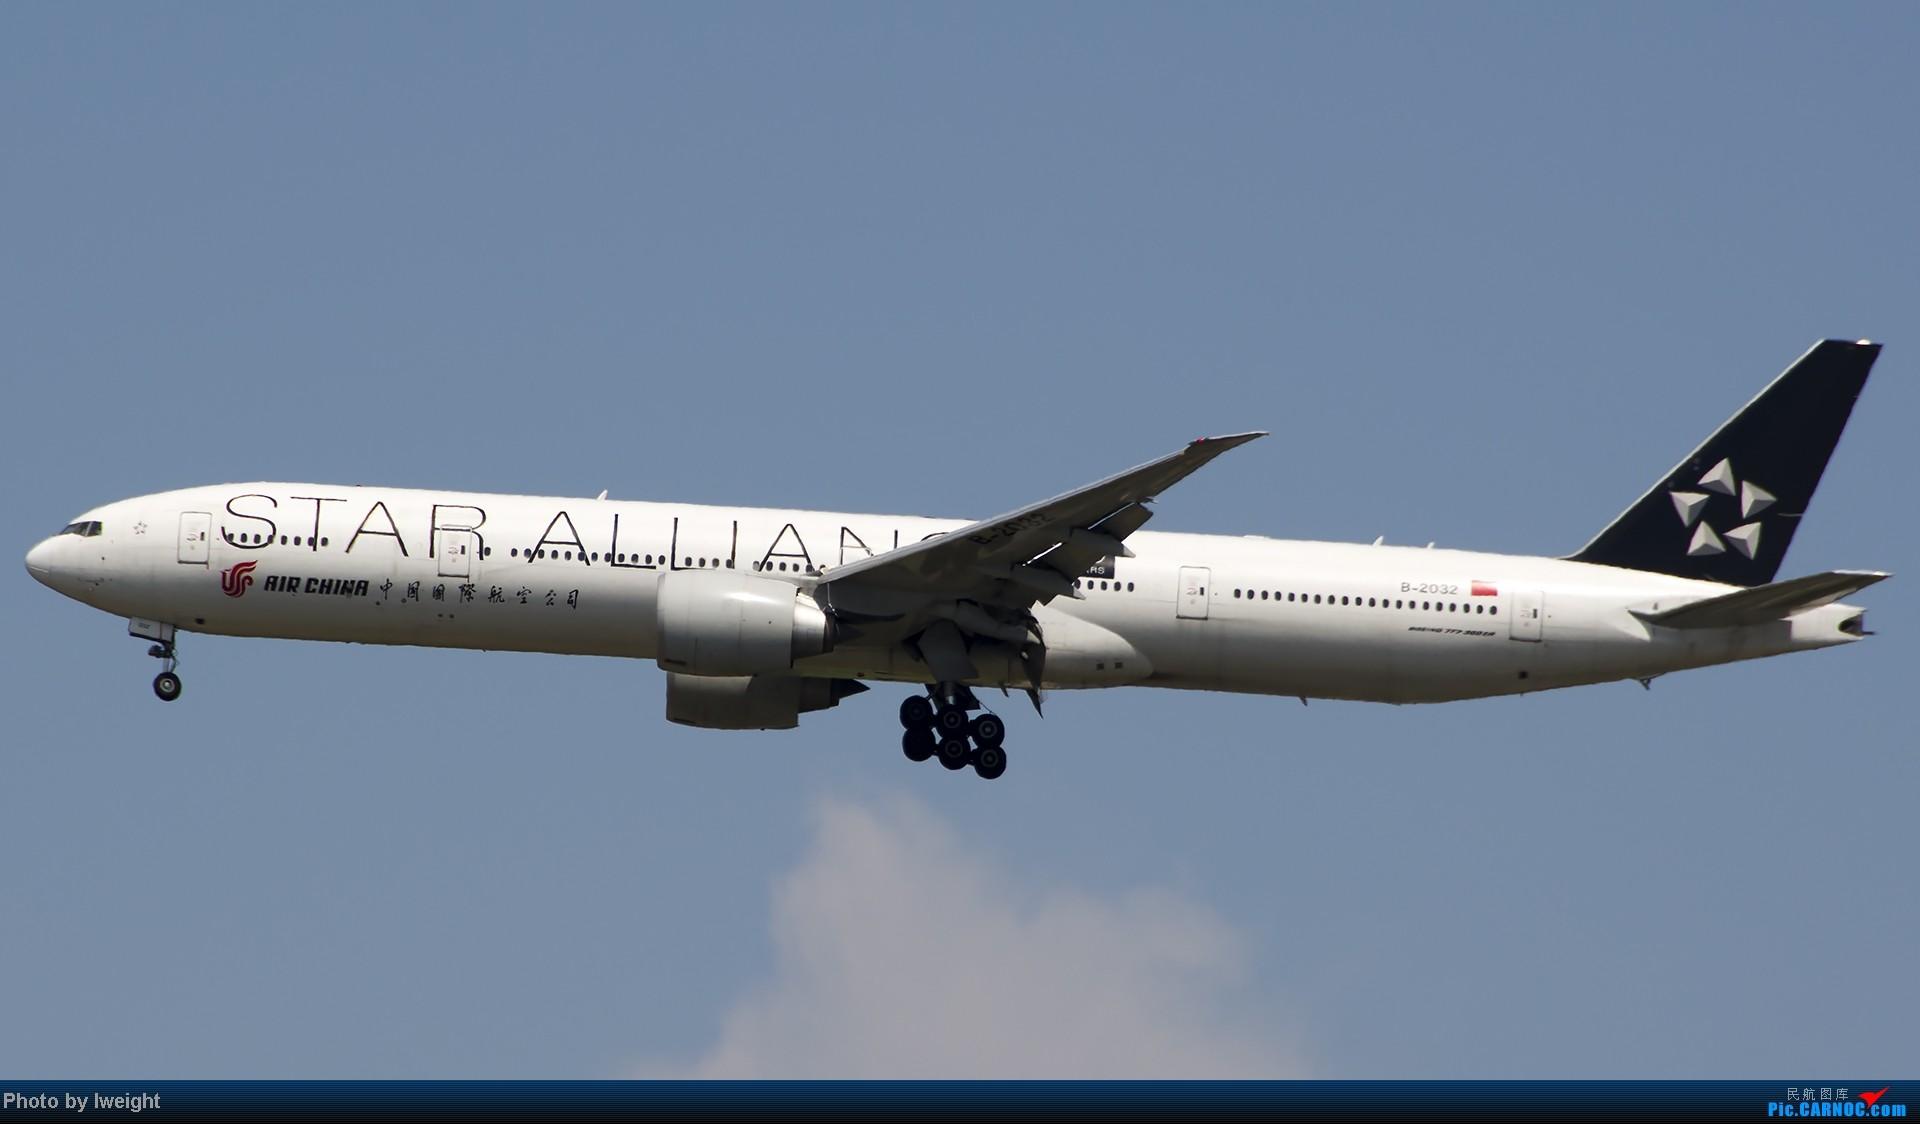 Re:[原创]7月13日下午随手拍机 BOEING 777-300 B-2032 中国北京首都机场